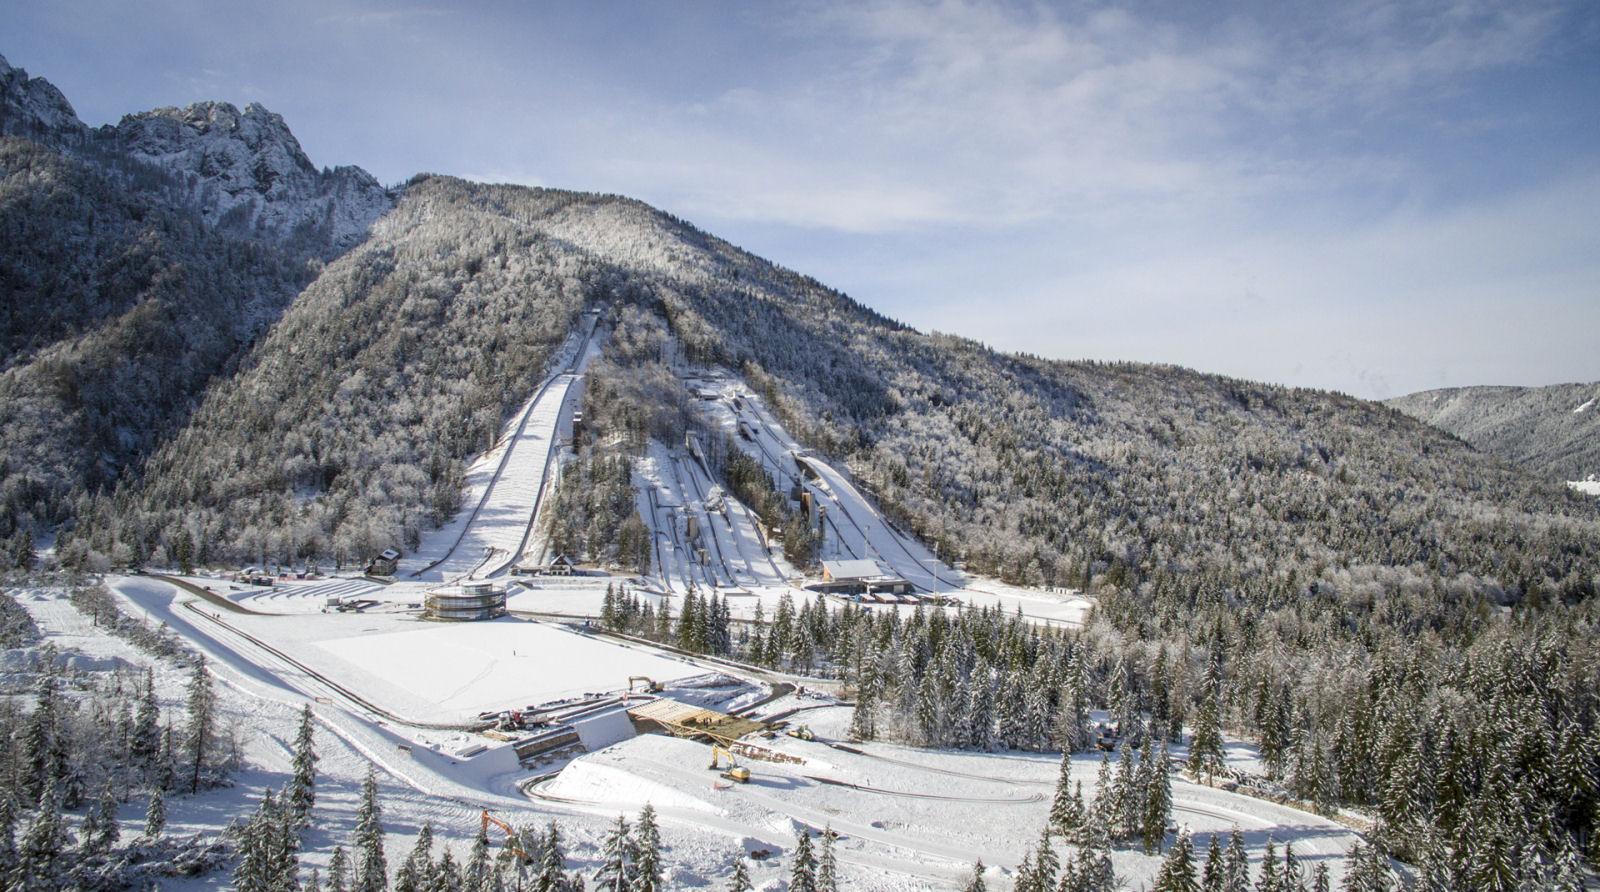 planica-nordic-centre-ski-jumping-hills